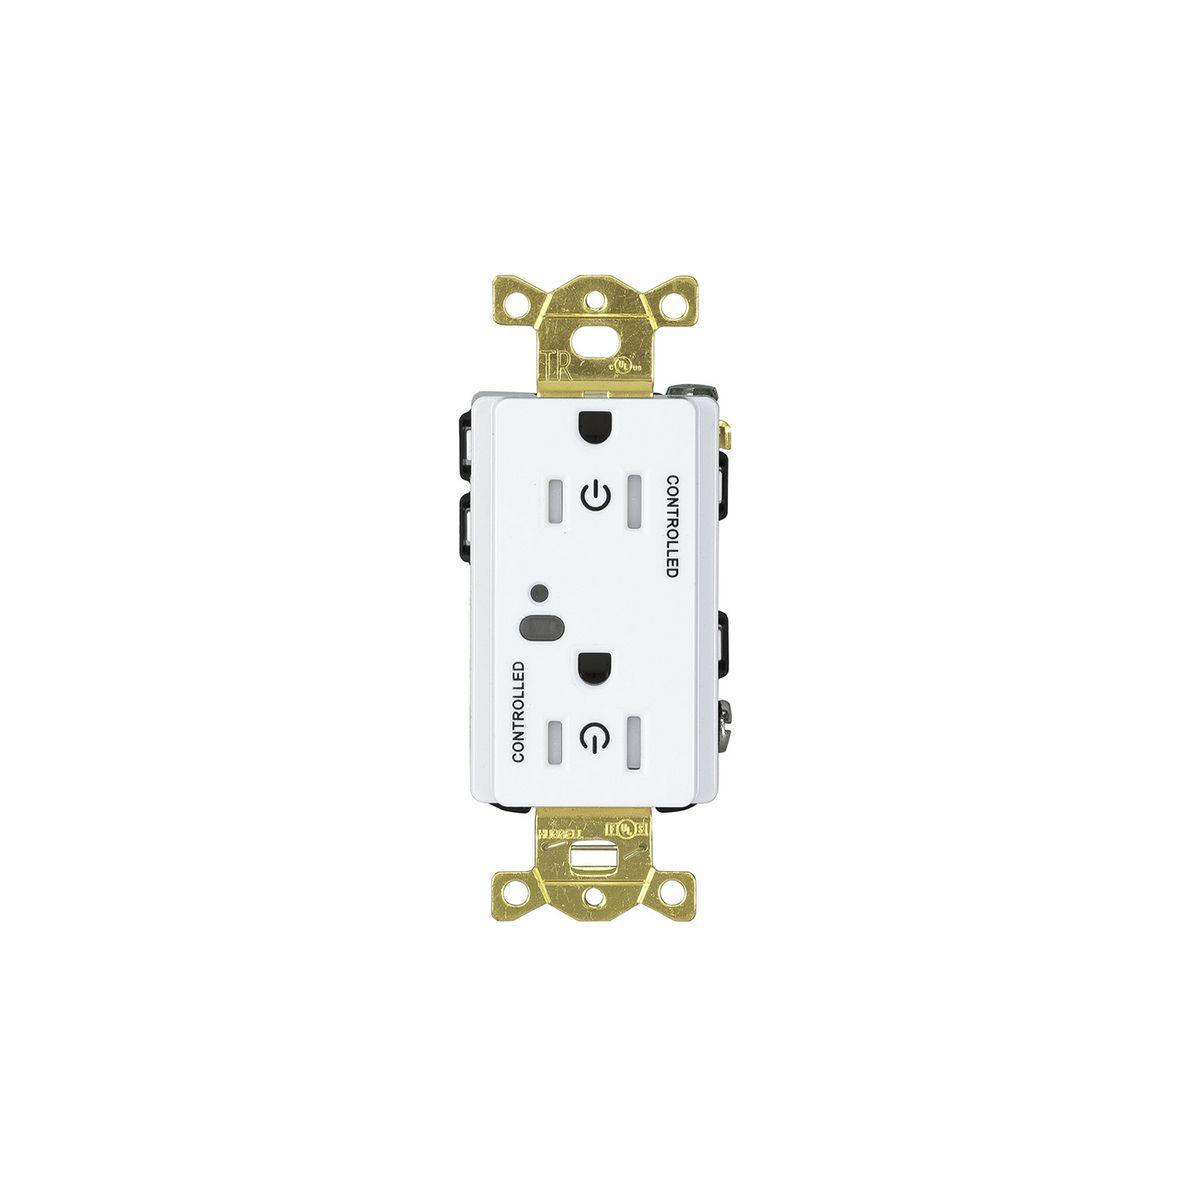 Occupancy Sensor Power Pack